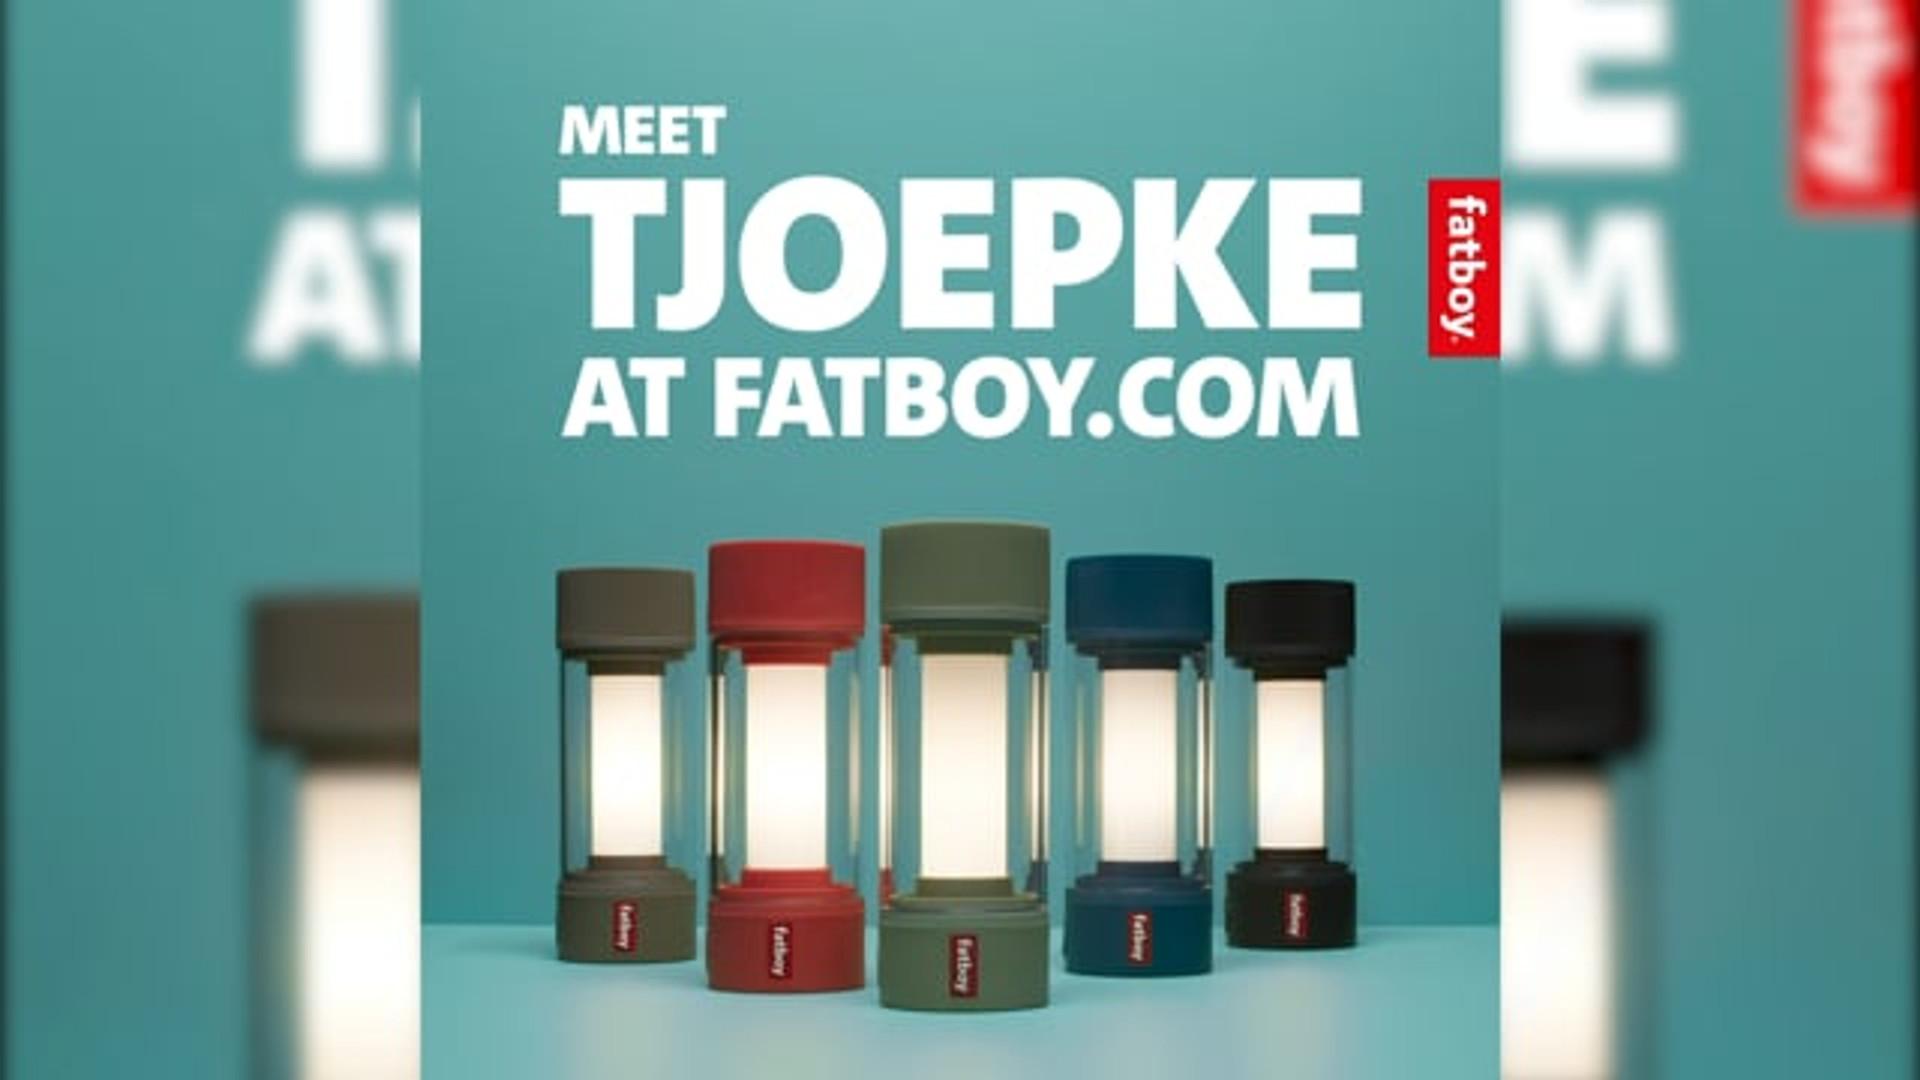 FATBOY's Tjoepke